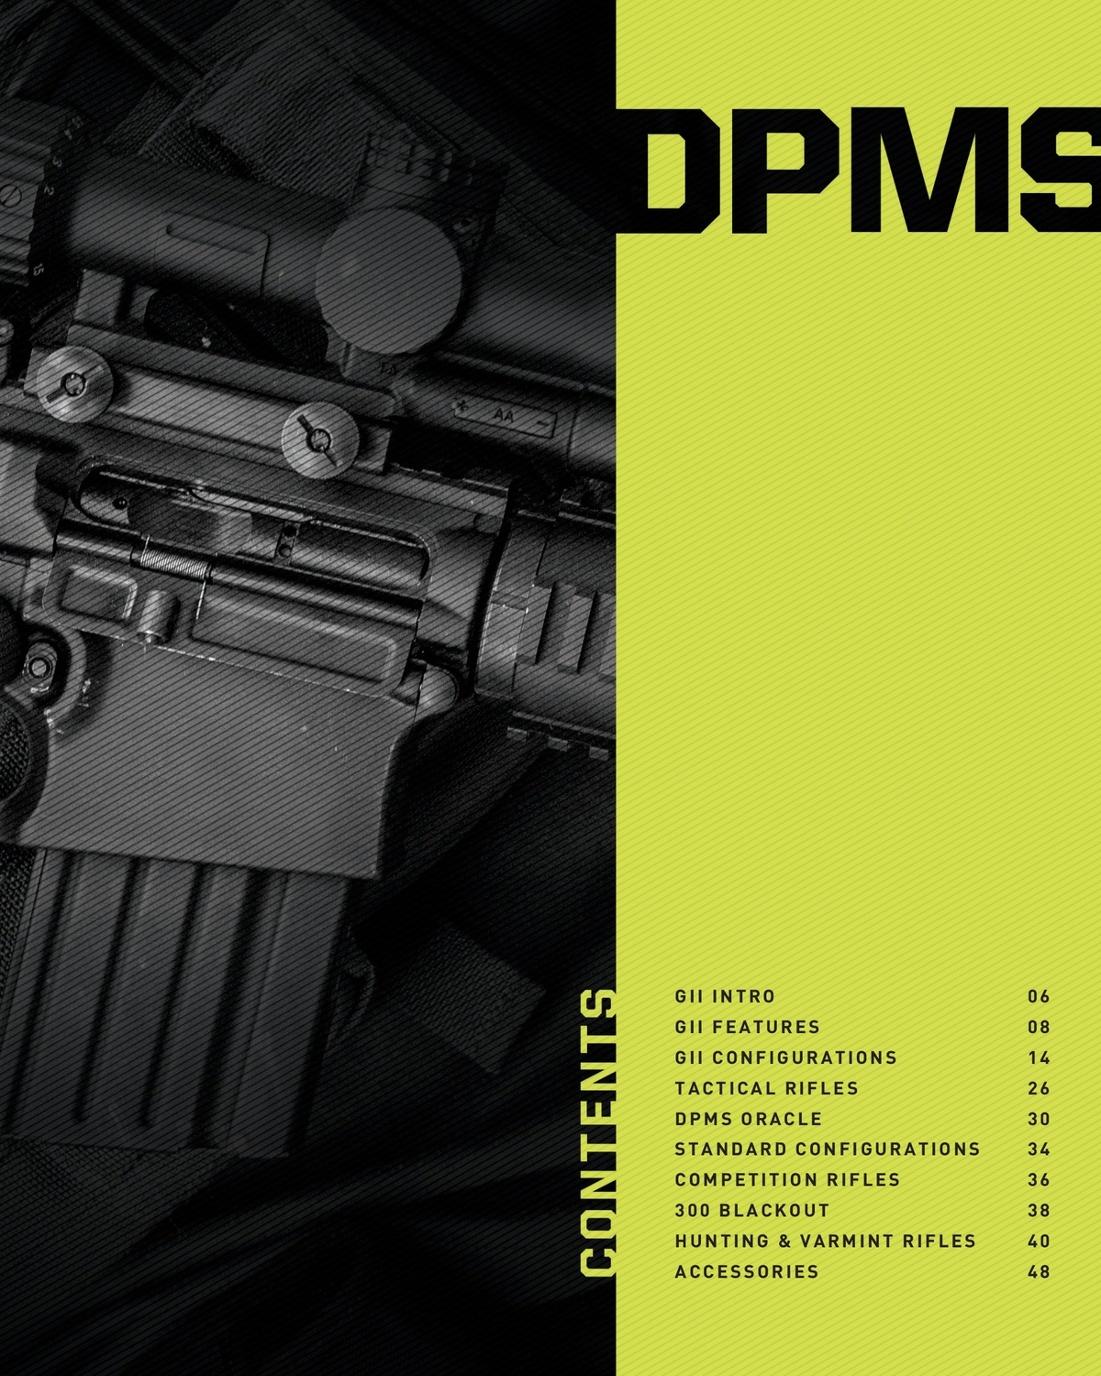 dpms schematics wiring diagram2017 dpms catalog dpms schematics